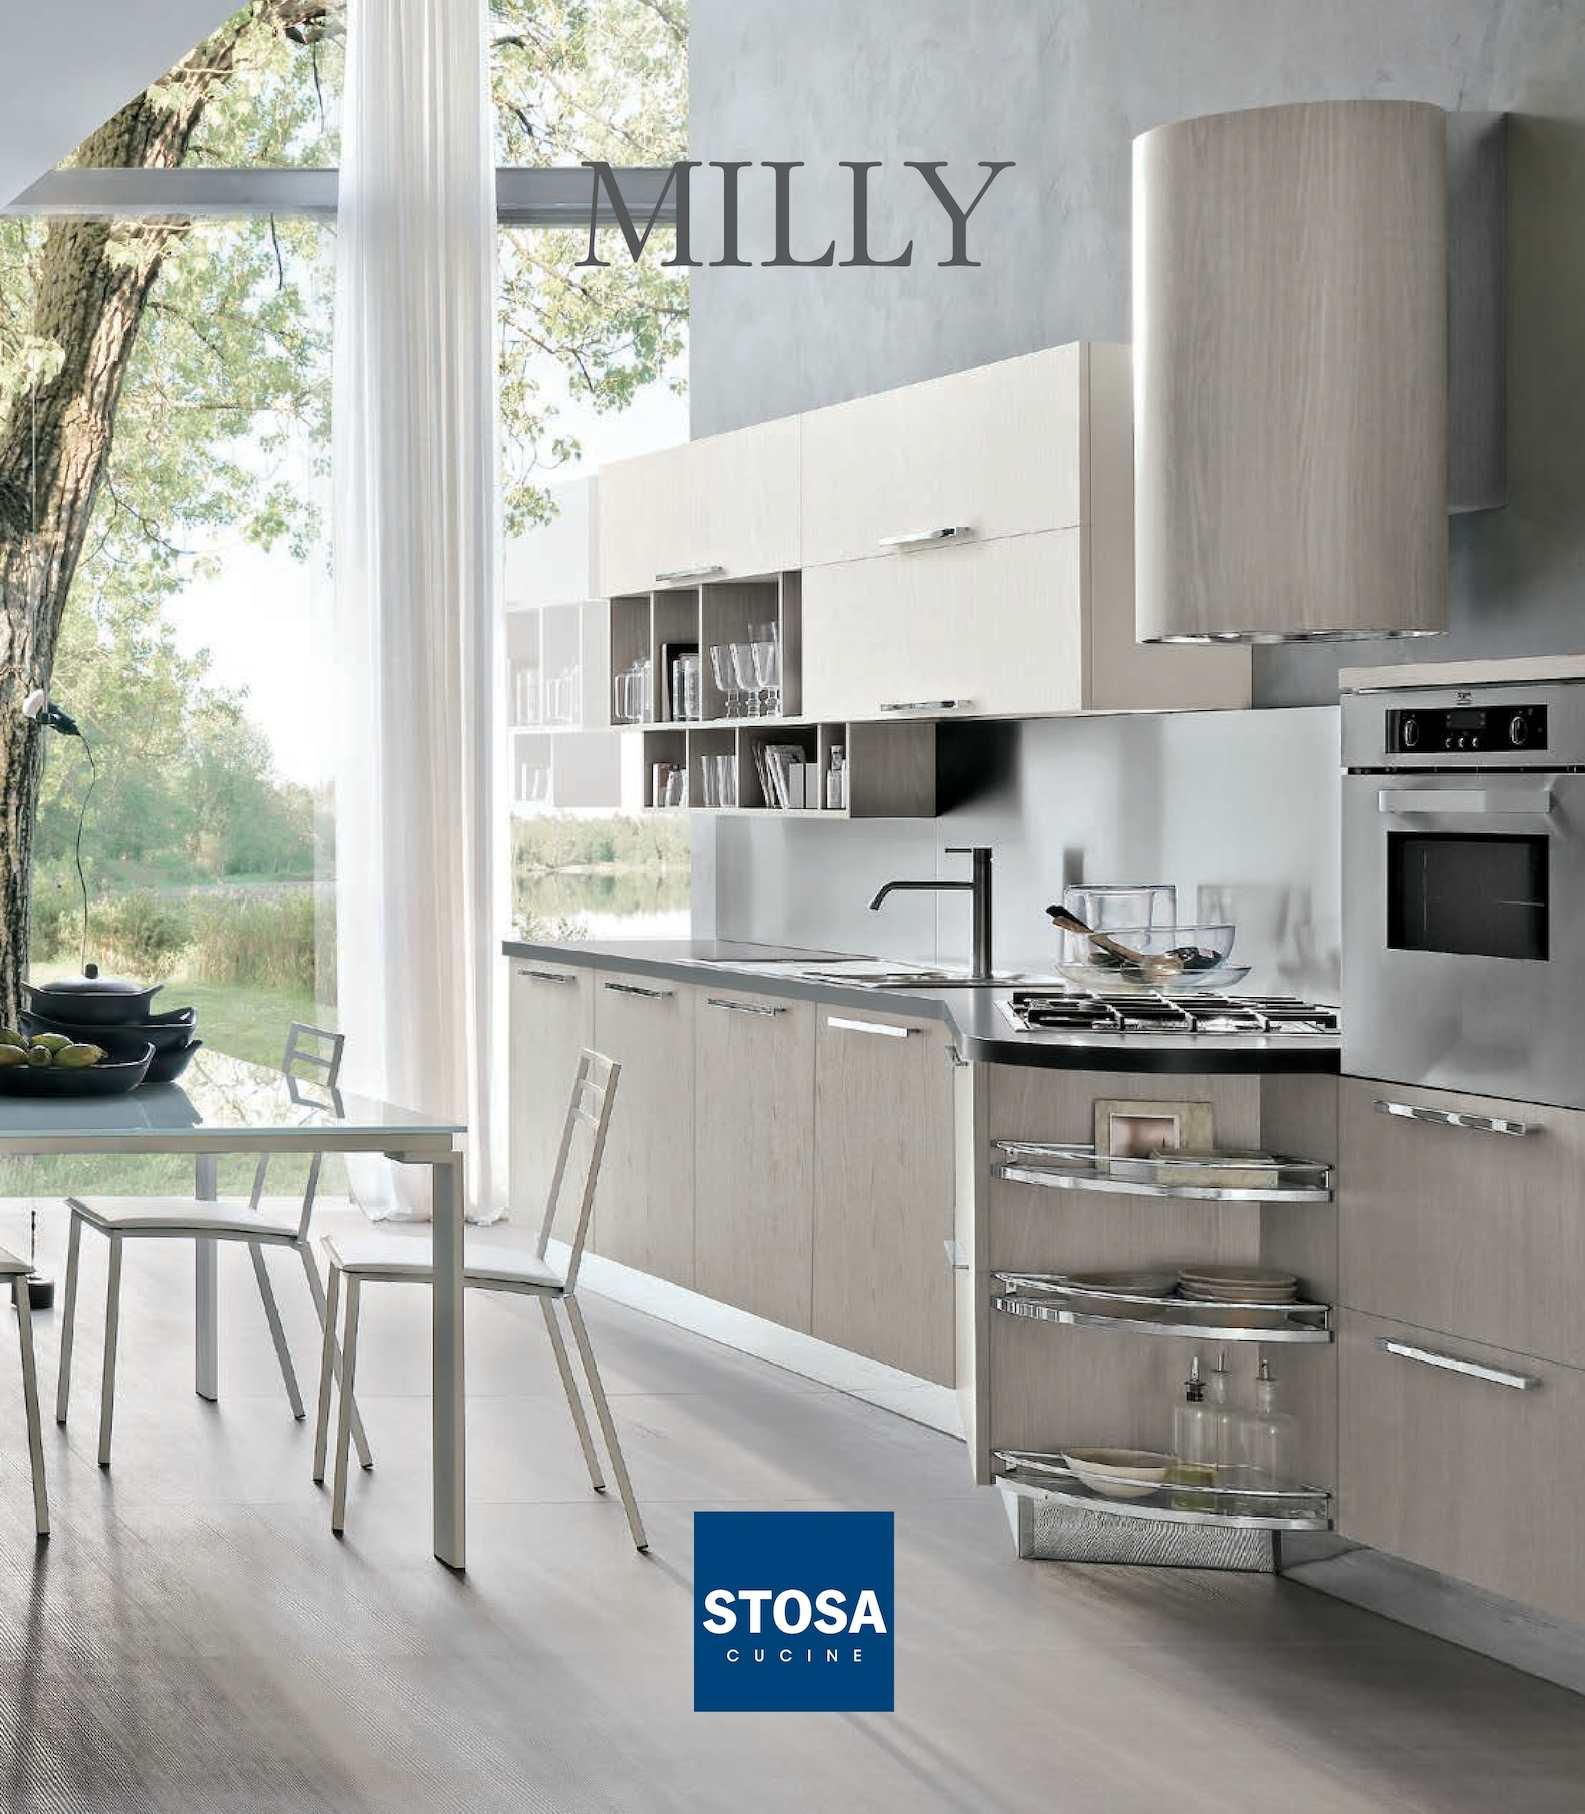 Calaméo - Stosa Cucine | Cucine Moderne | Milly